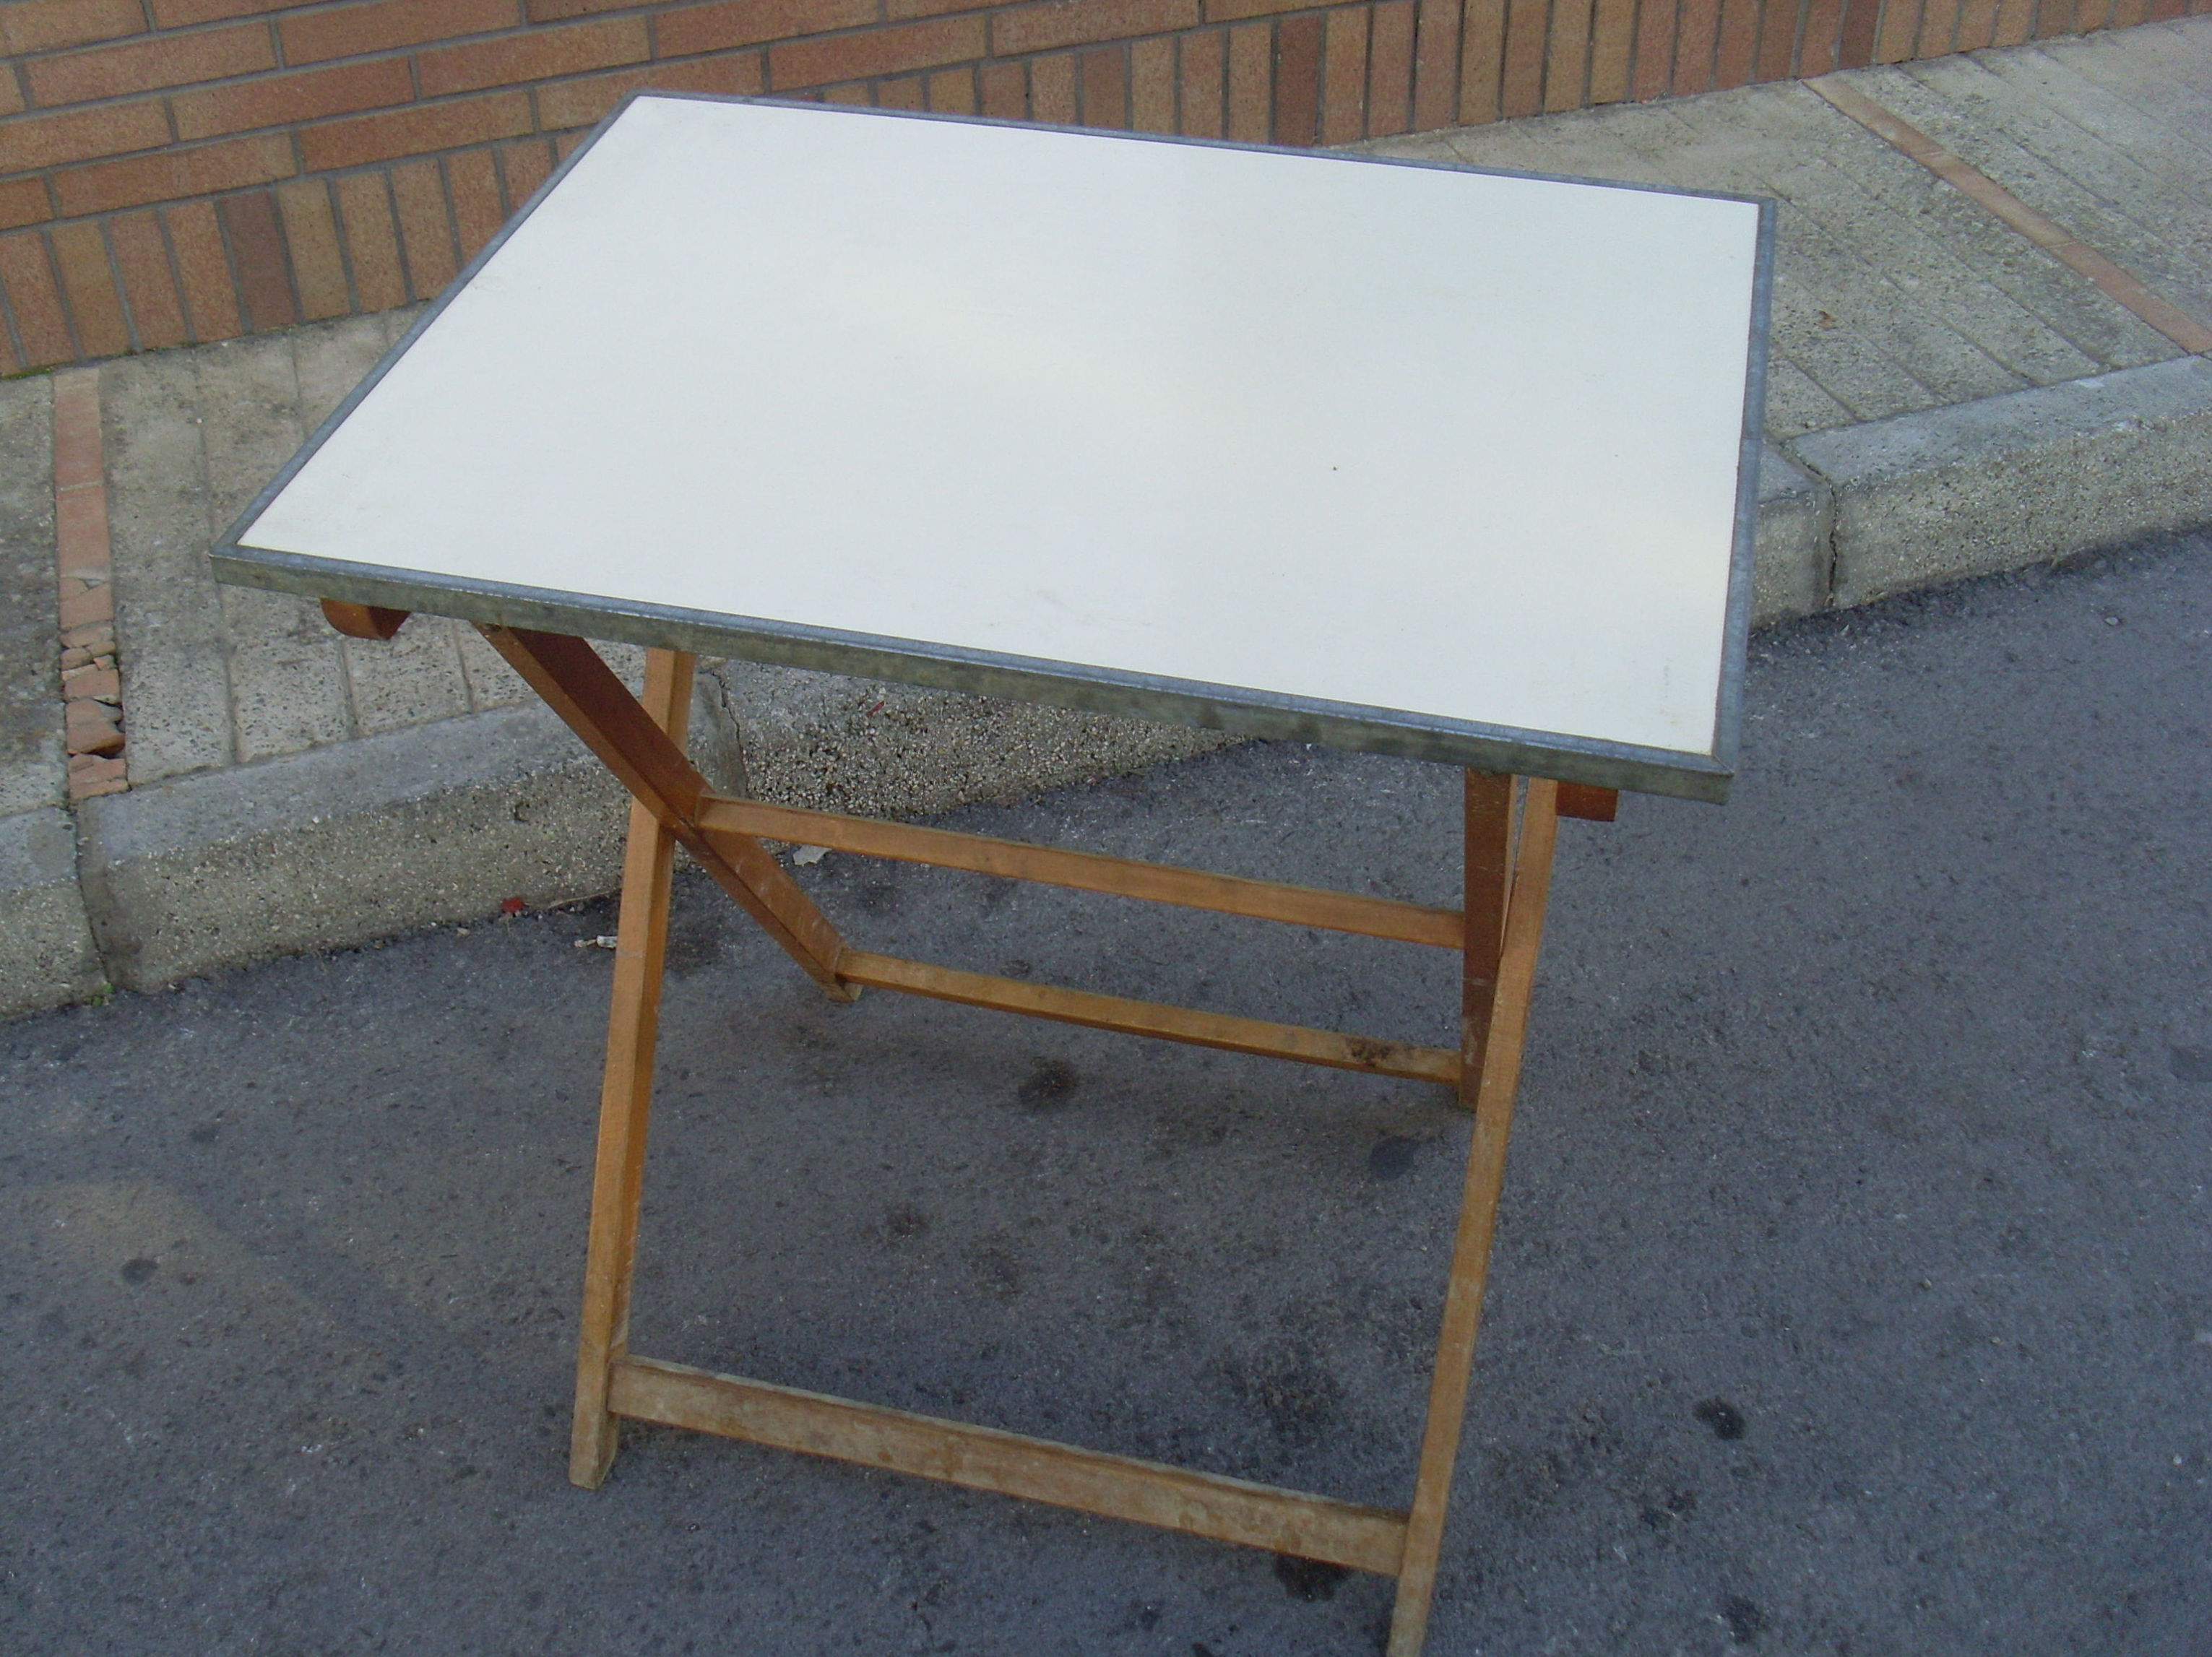 Mesa velador plegable madera tapa formica blanca cat logo de jedal alquileres - Velador plegable ...